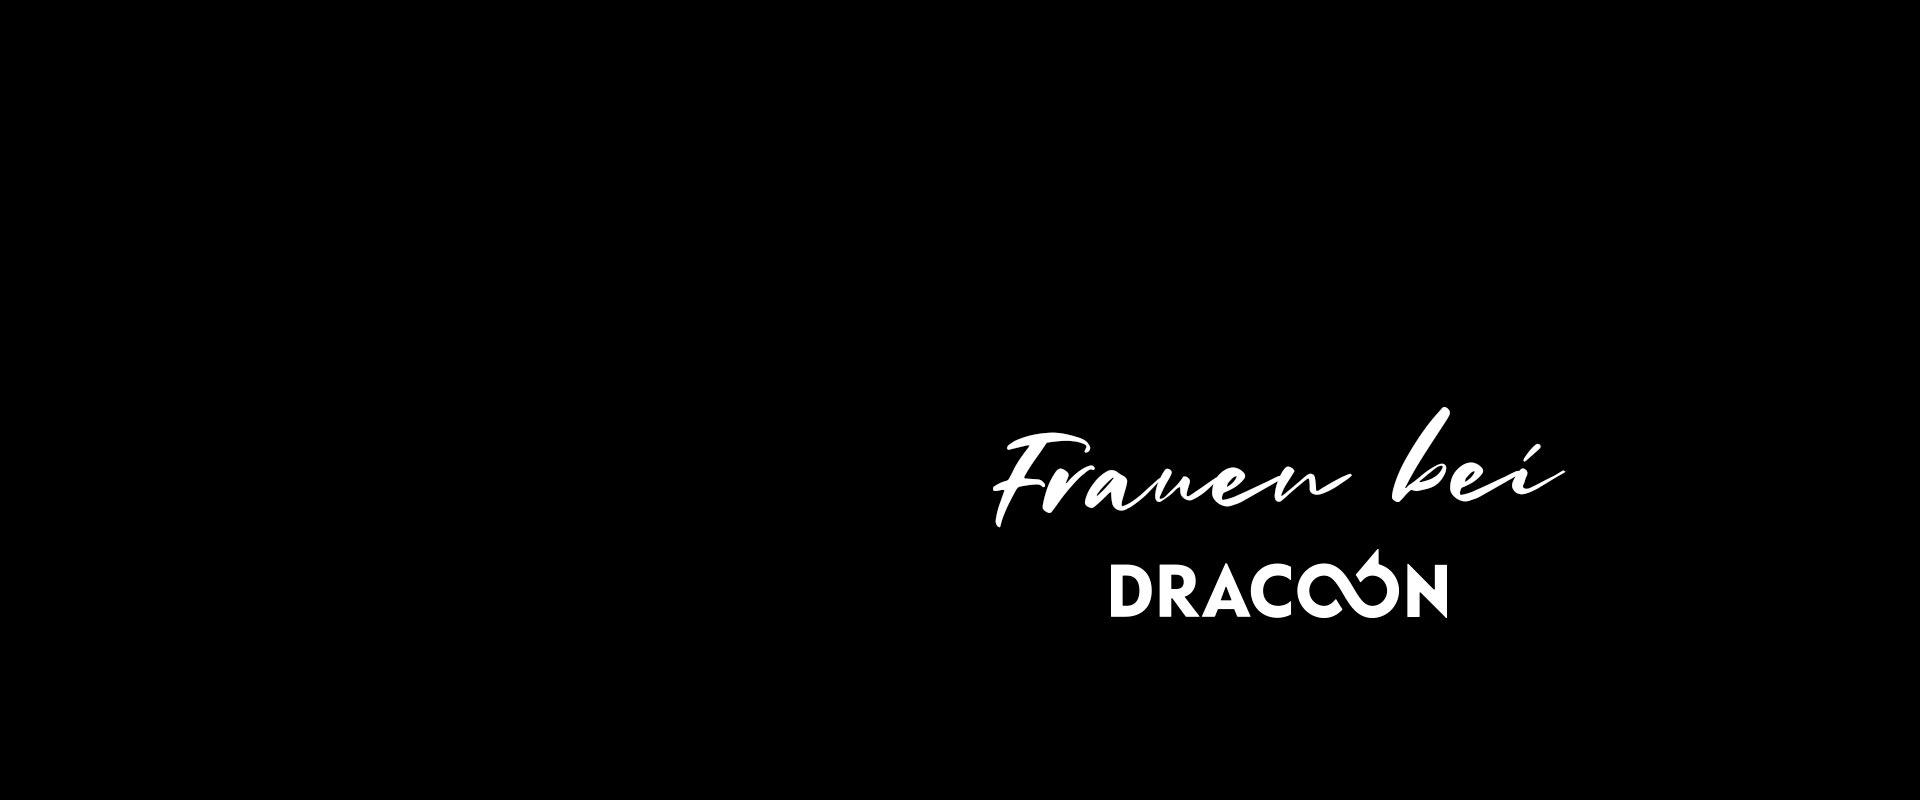 Frauen bei DRACOON